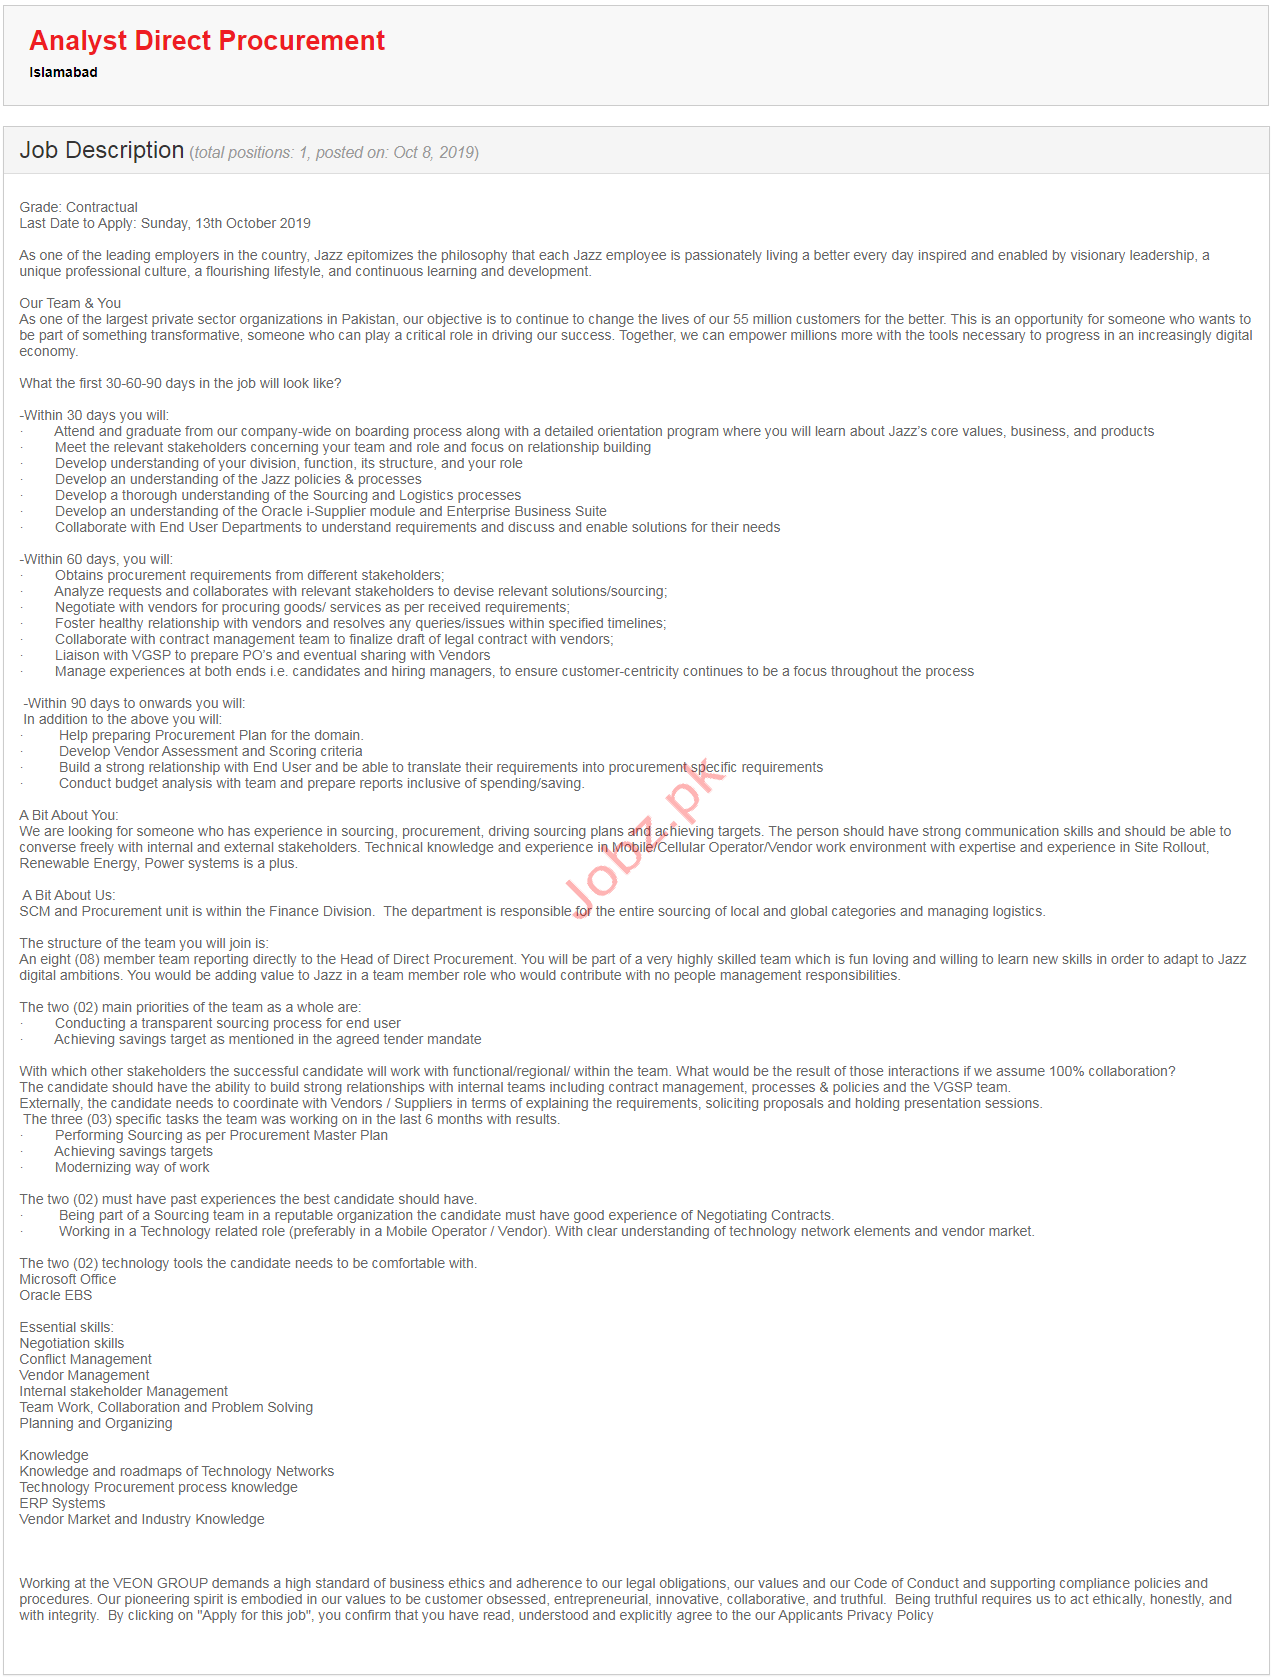 Analyst Direct Procurement Jobs in Islamabad